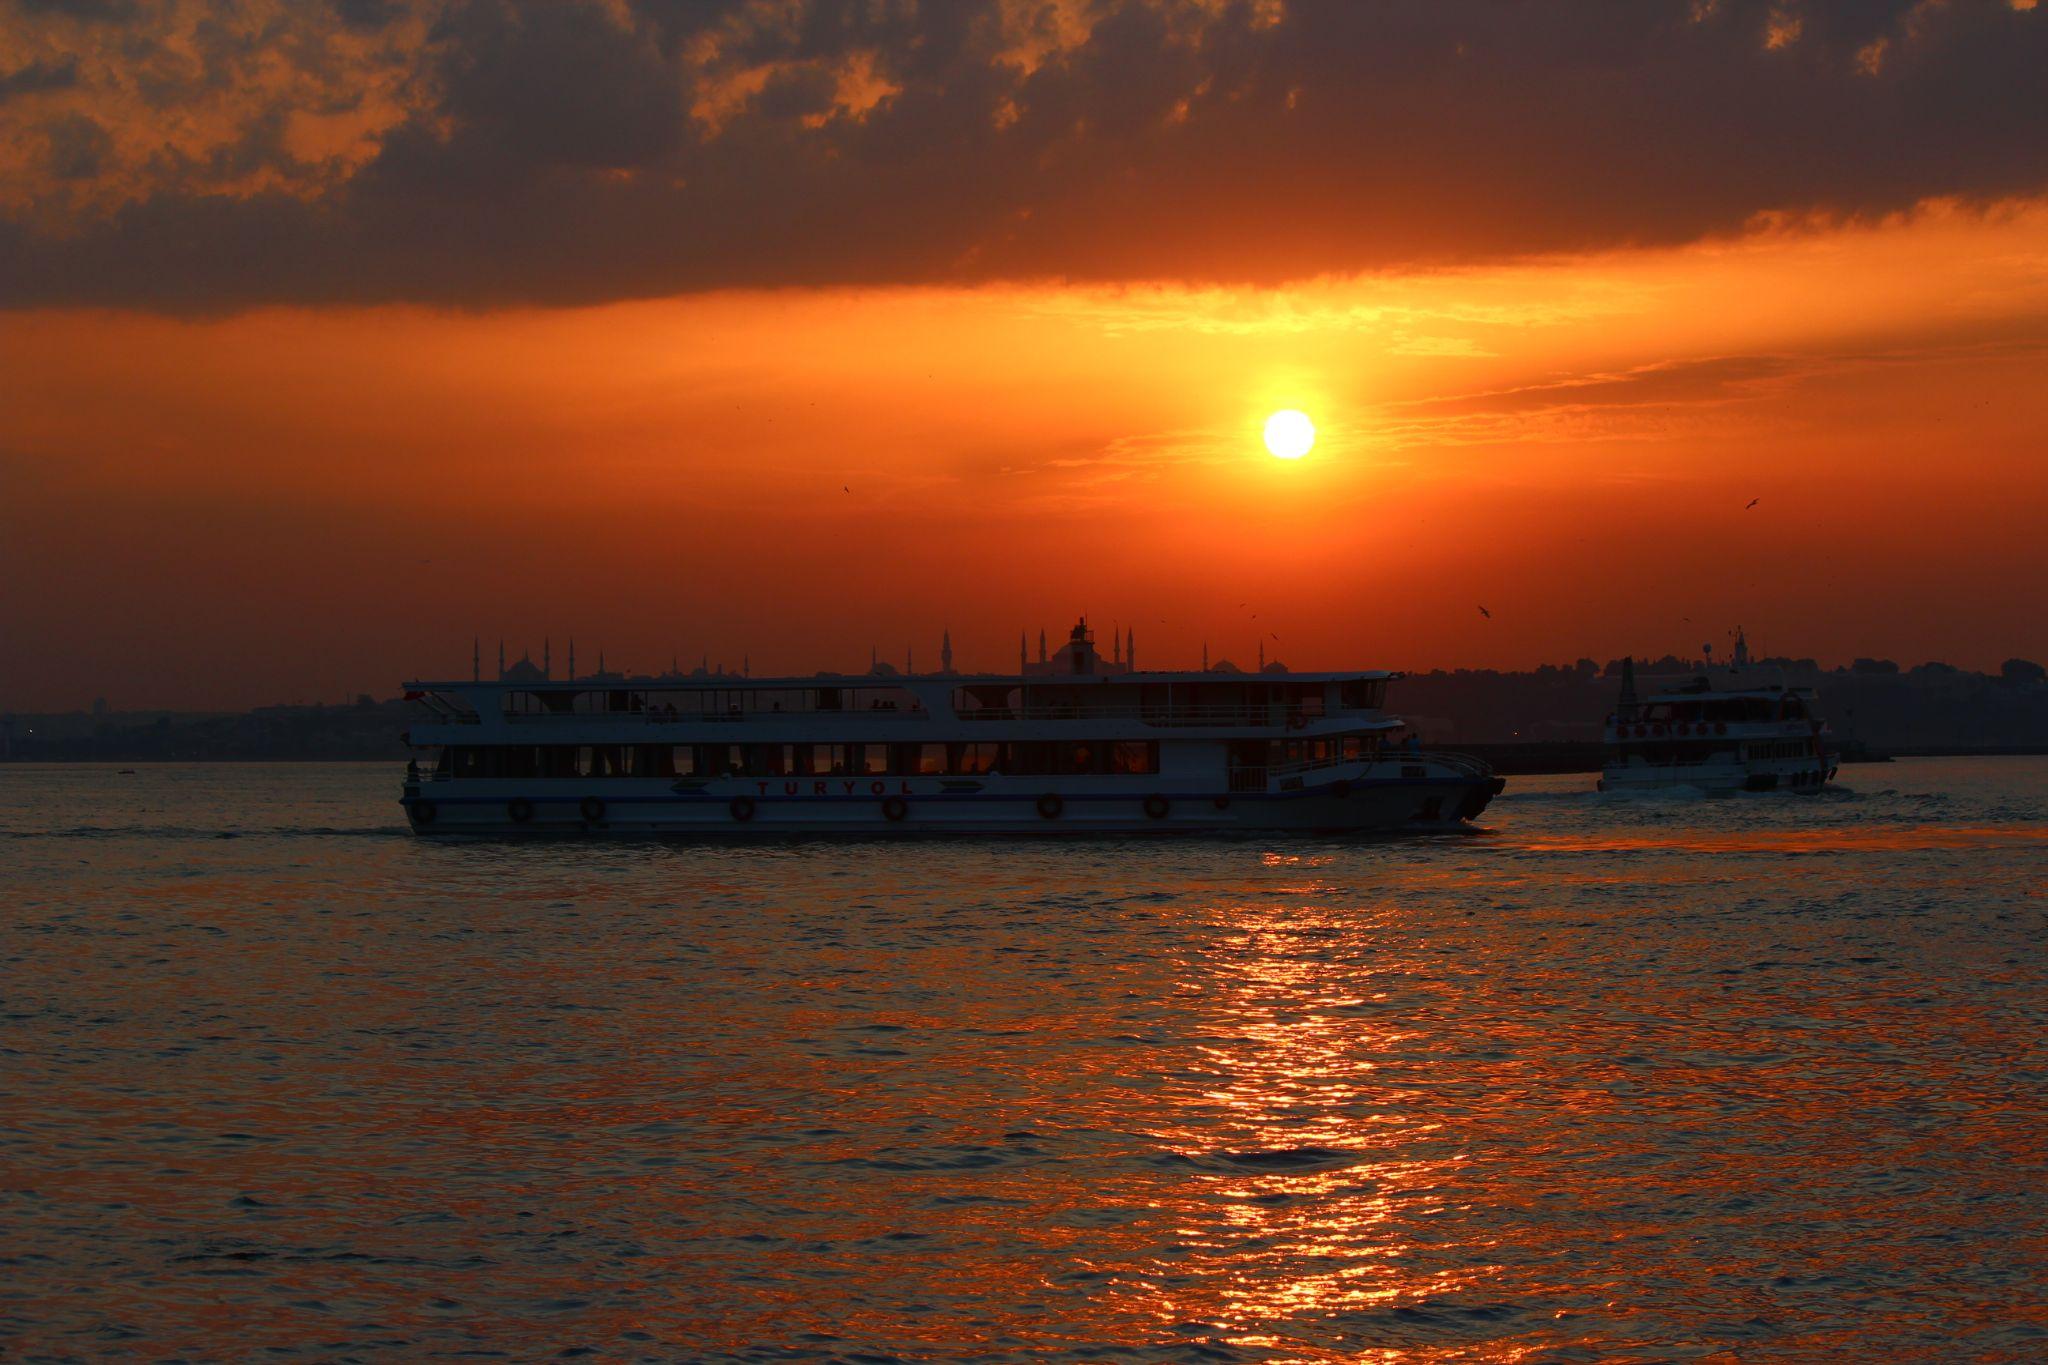 İstanbul sunset by Ali Kemal Özer